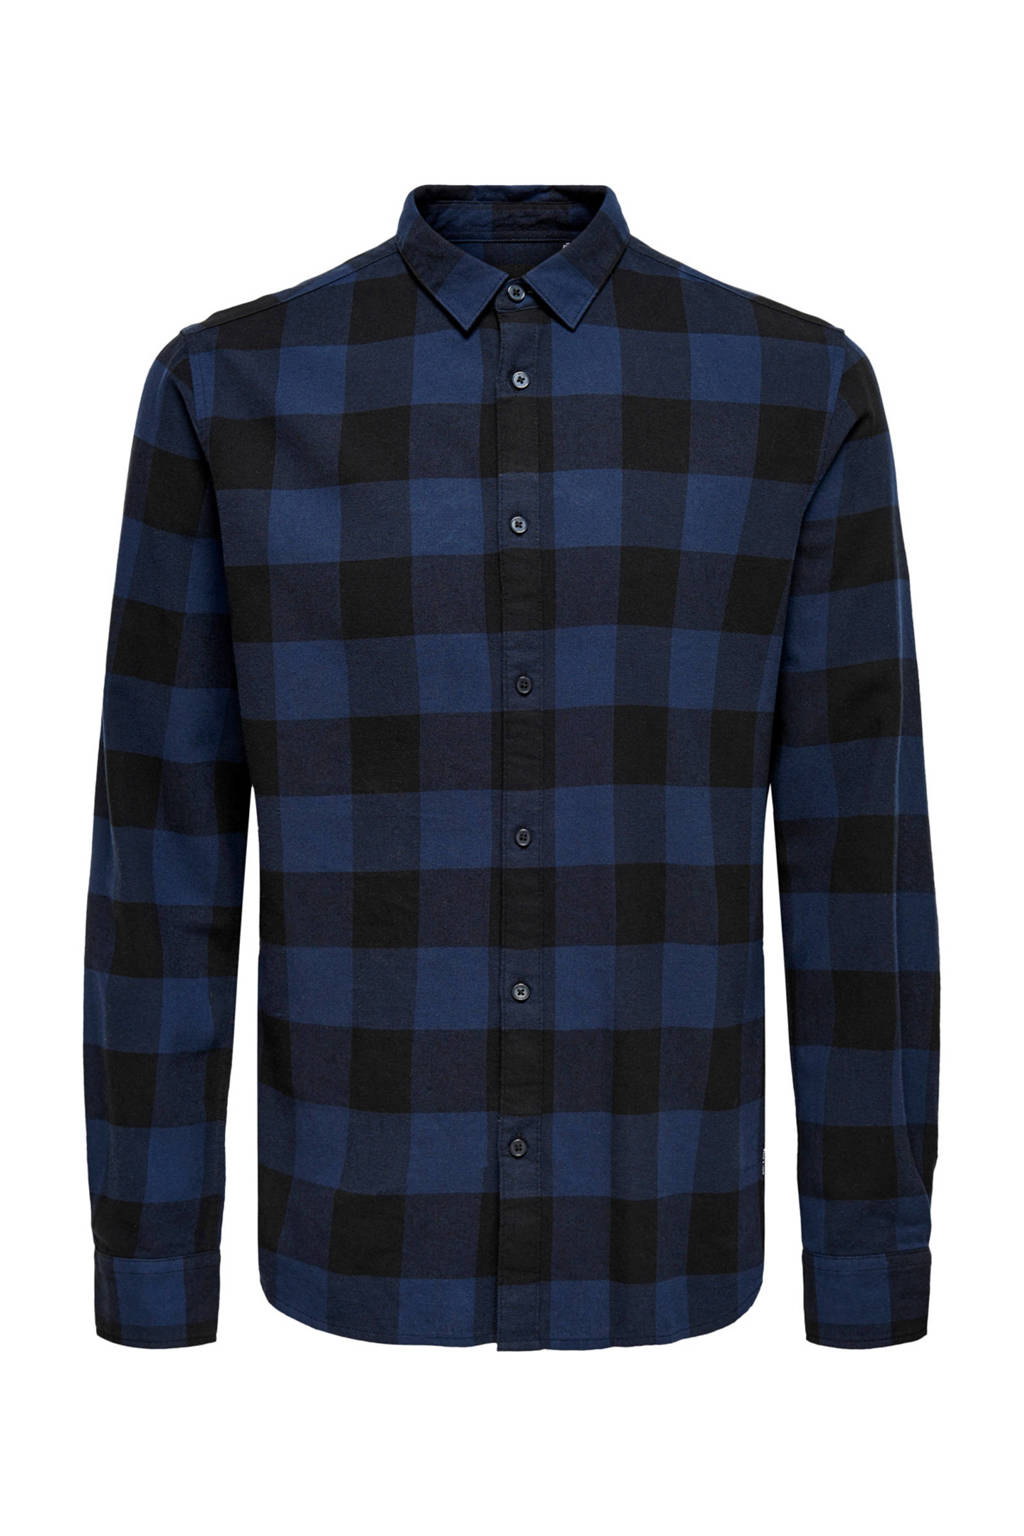 ONLY & SONS geruit slim fit overhemd kobaltblauw, Kobaltblauw